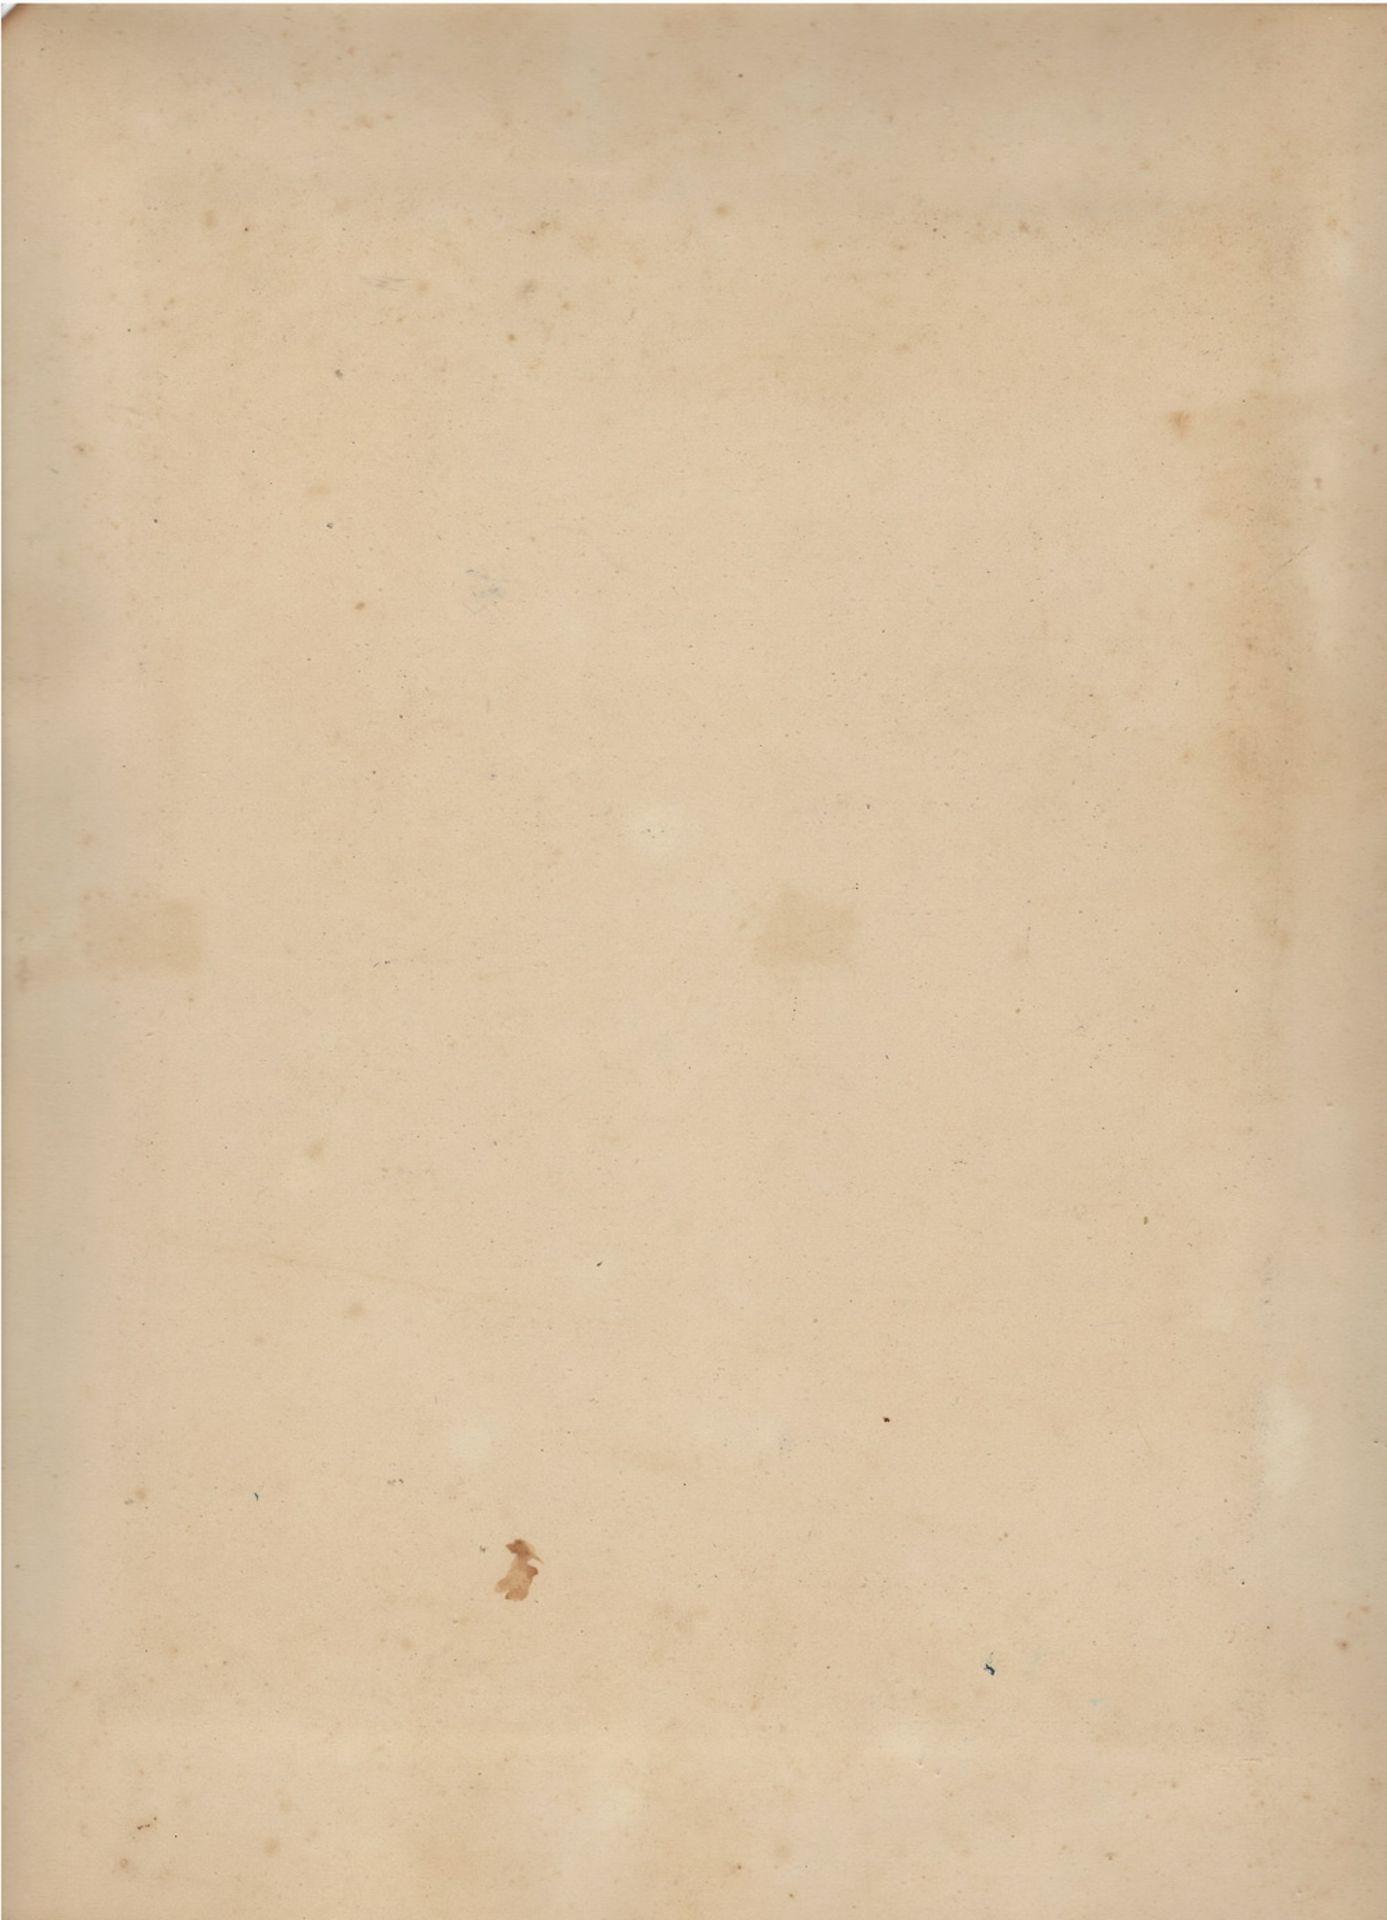 [Russian Empire]. 2 group family portraits. Photographs. Vintage prints. Late 19th century. 22x30 -  - Bild 2 aus 4